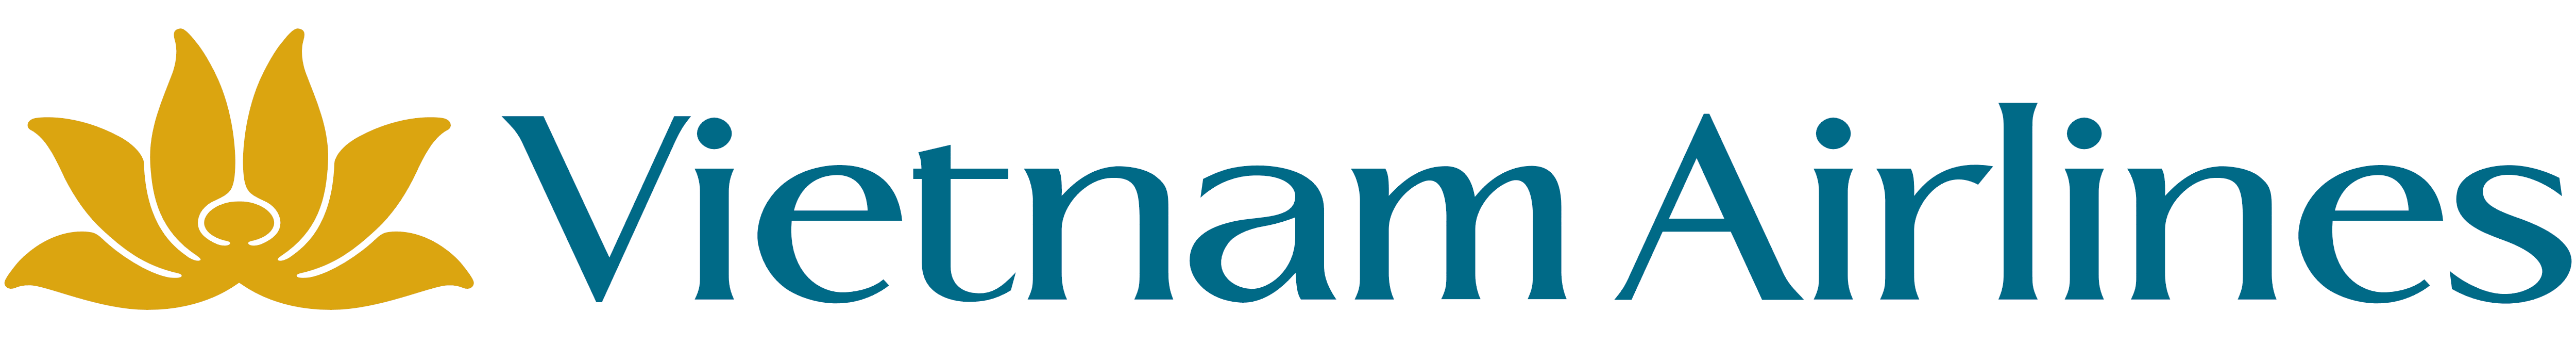 Vietnam Airlines logo, logotype